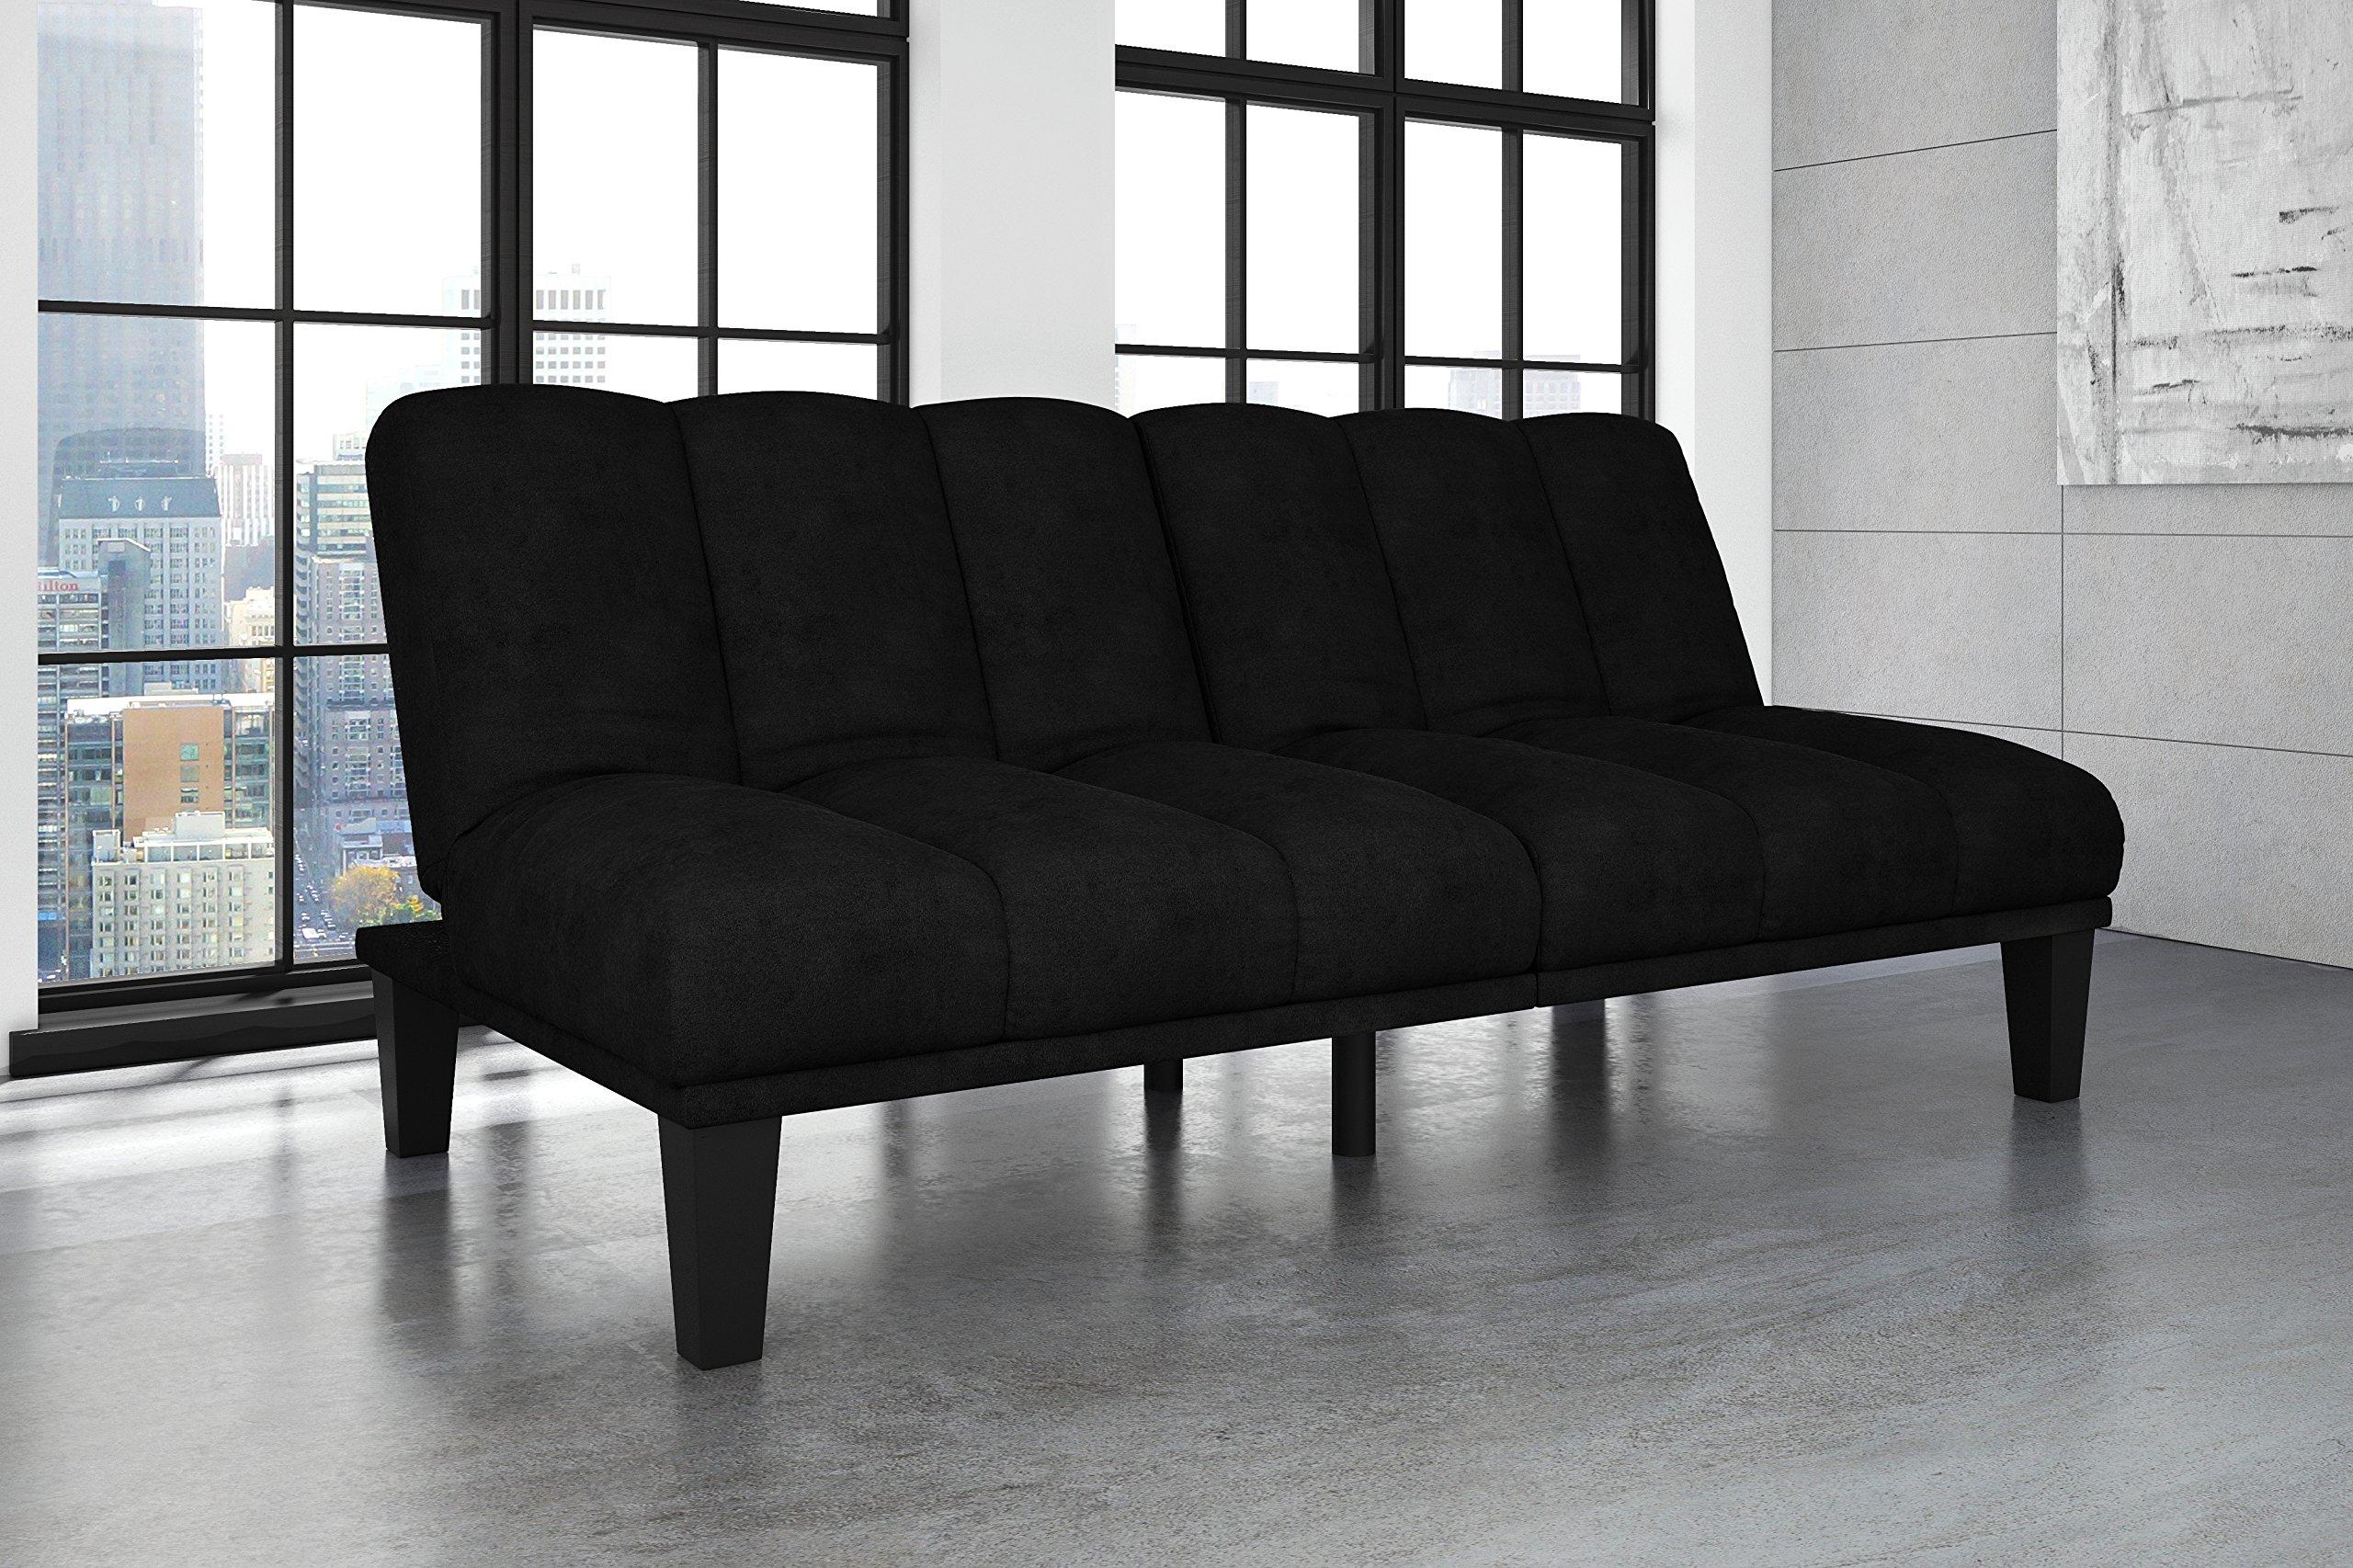 Hamilton Estate Premium Sofa Futon Sleeper Comfortable Plush Upholstery, Rich Black by DHP (Image #1)